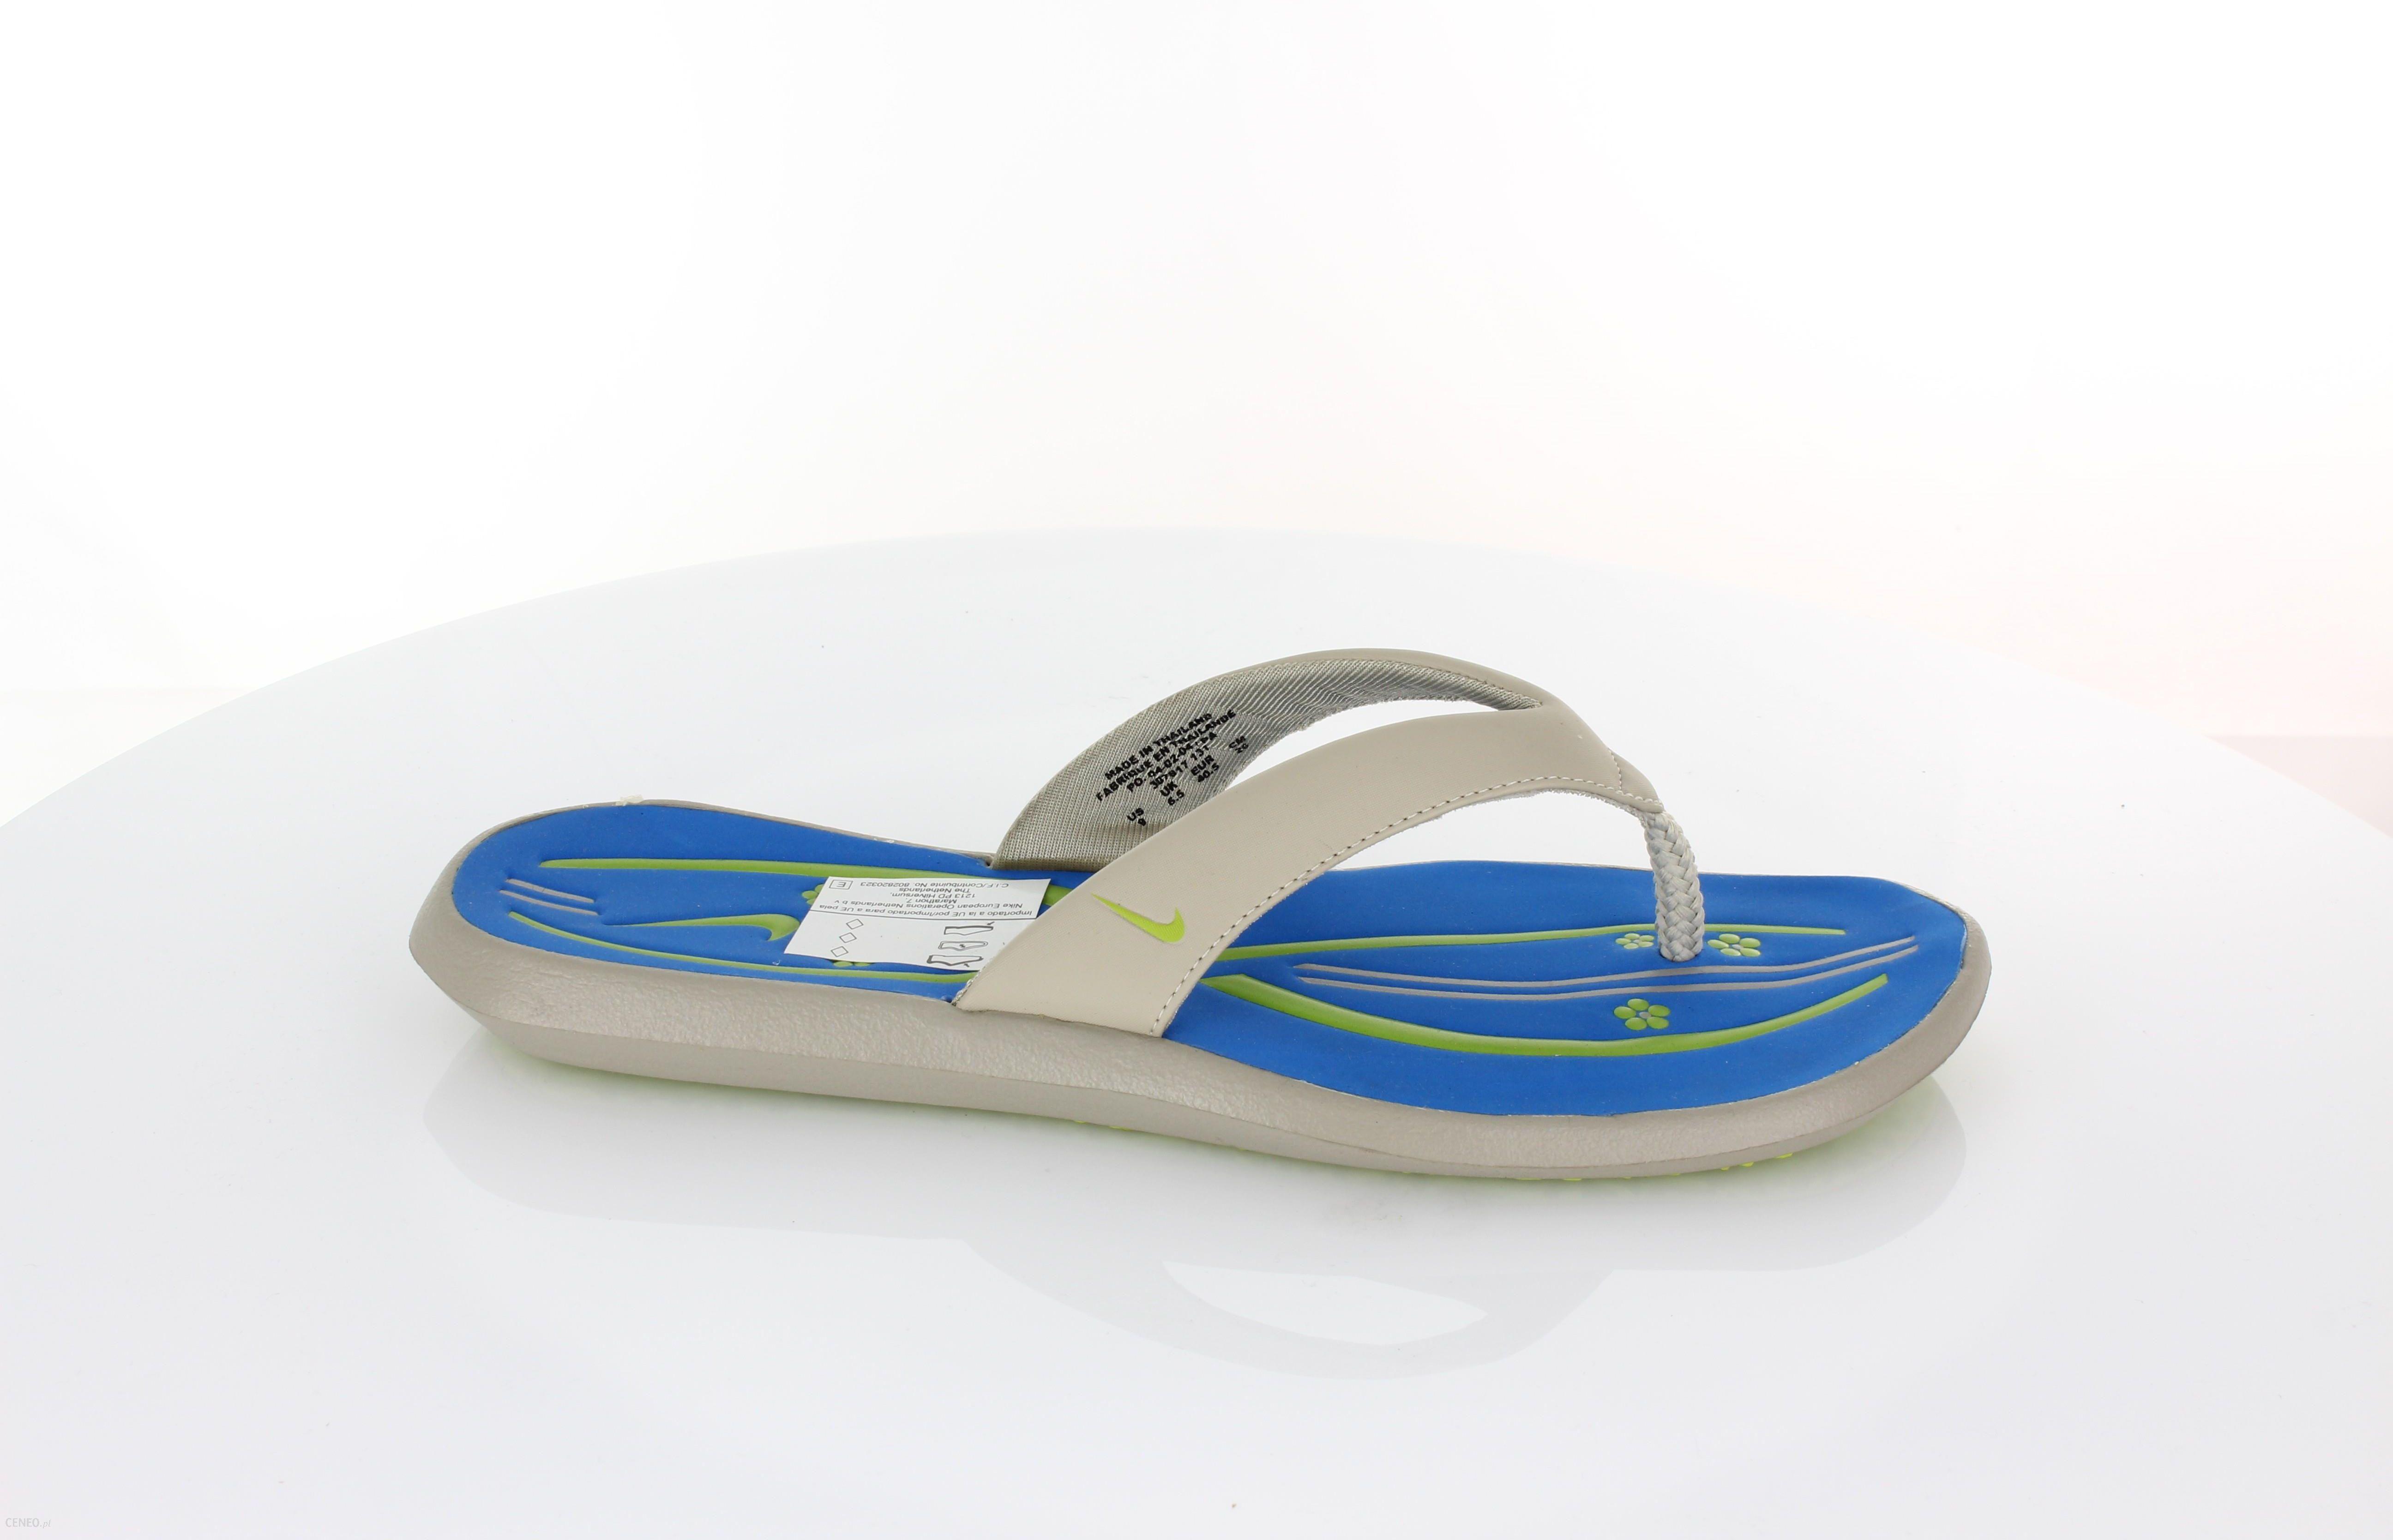 cebra creativo Competir  Japonki Nike Vintage WMNS TIKI THONG 307817 131 - Ceny i opinie - Ceneo.pl